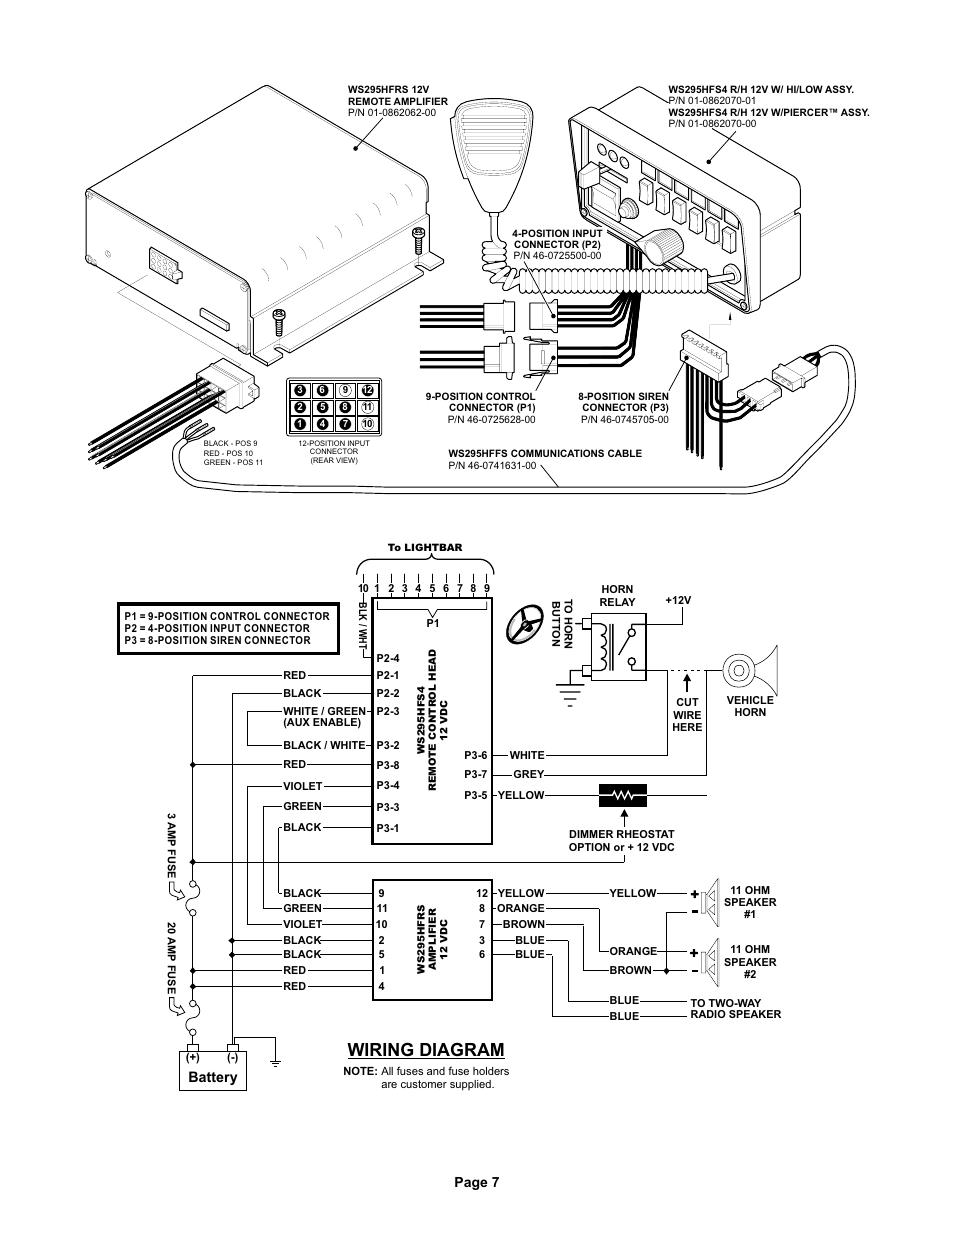 Whelen Liberty Bar Wiring Diagram Universal Power Lock